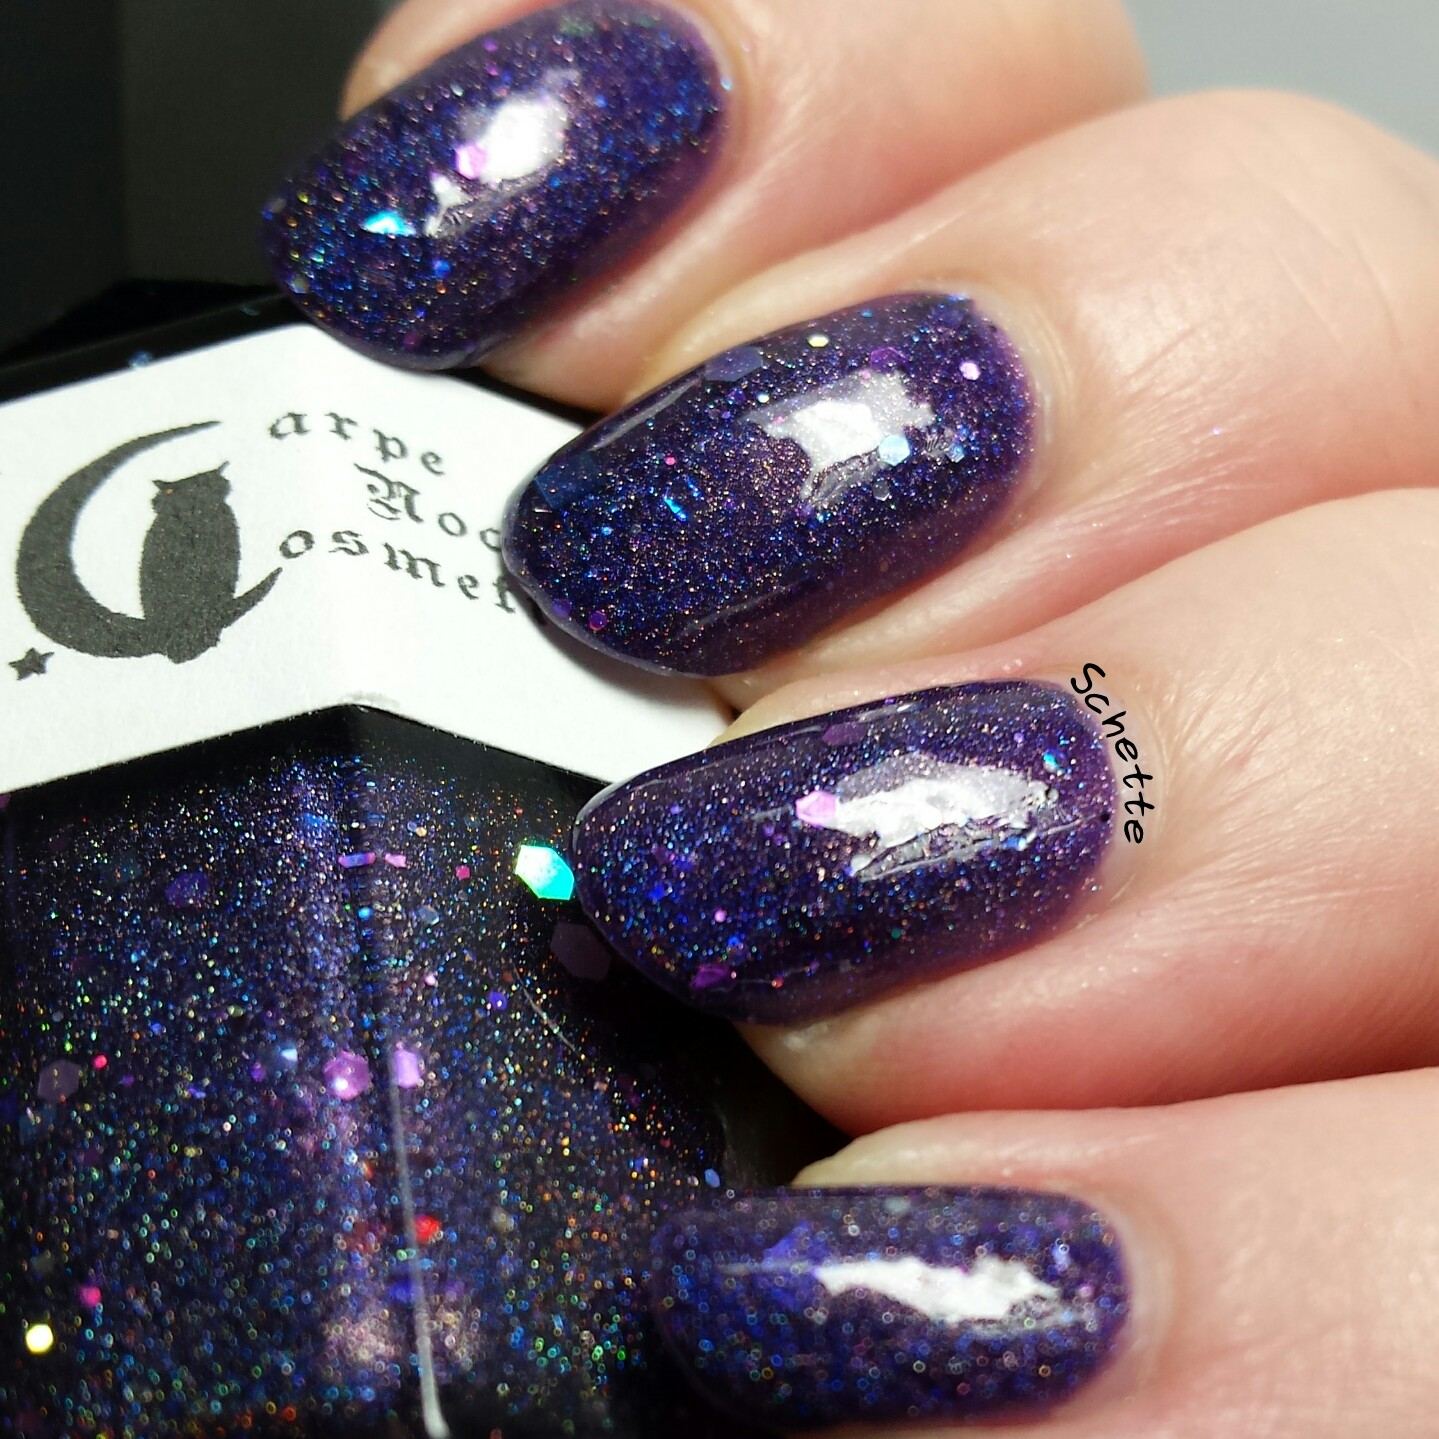 Carpe Noctem Cosmetics : My nurse has sparkles